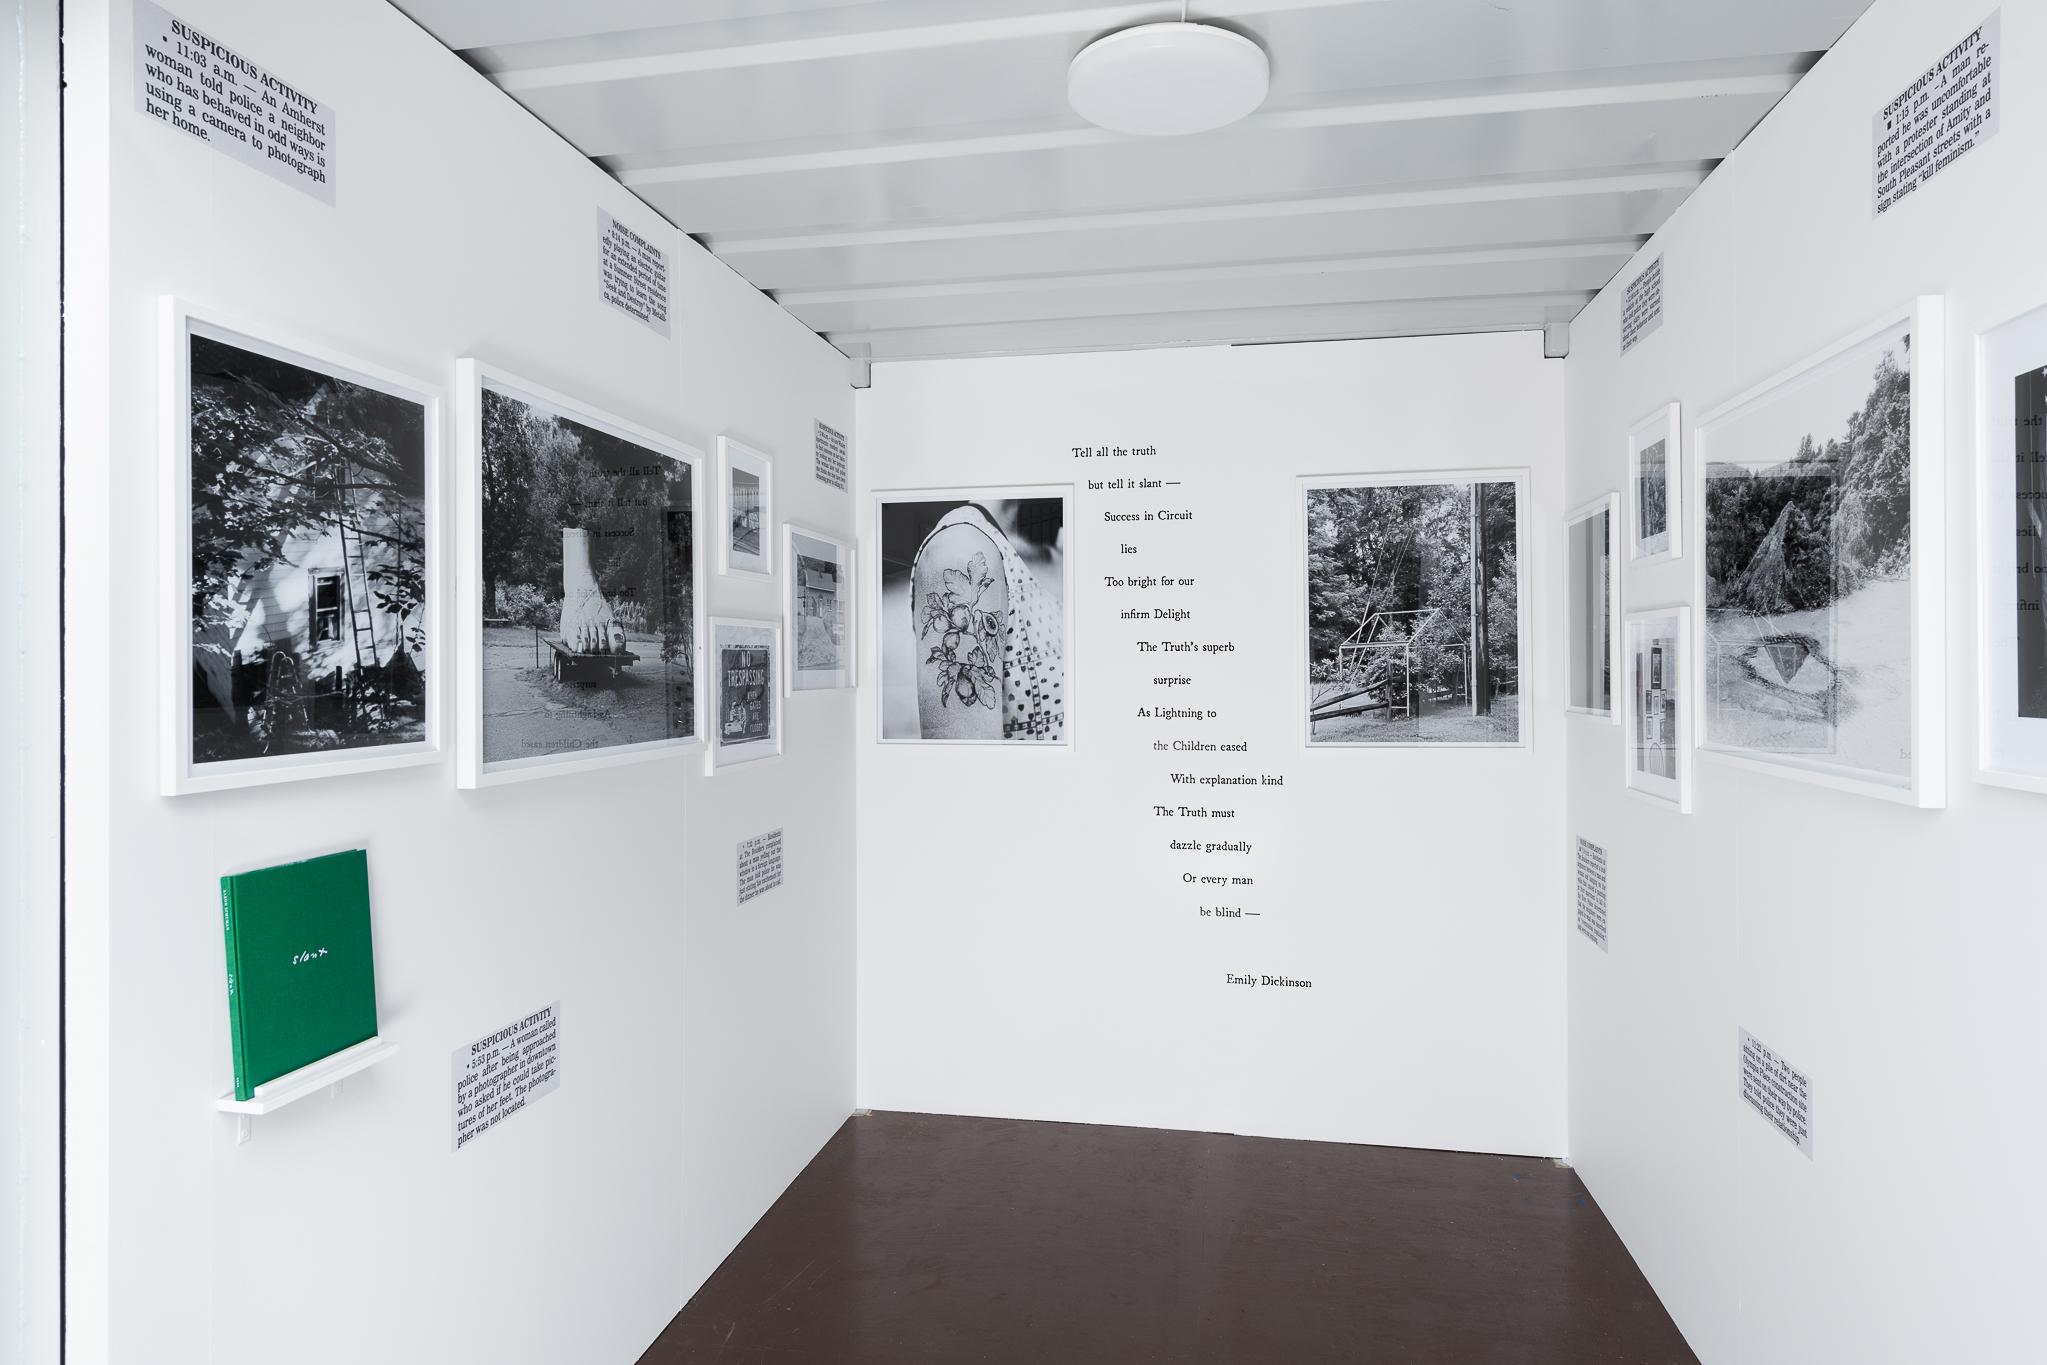 FOTOBOKFESTIVAL OSLO 2020 2019